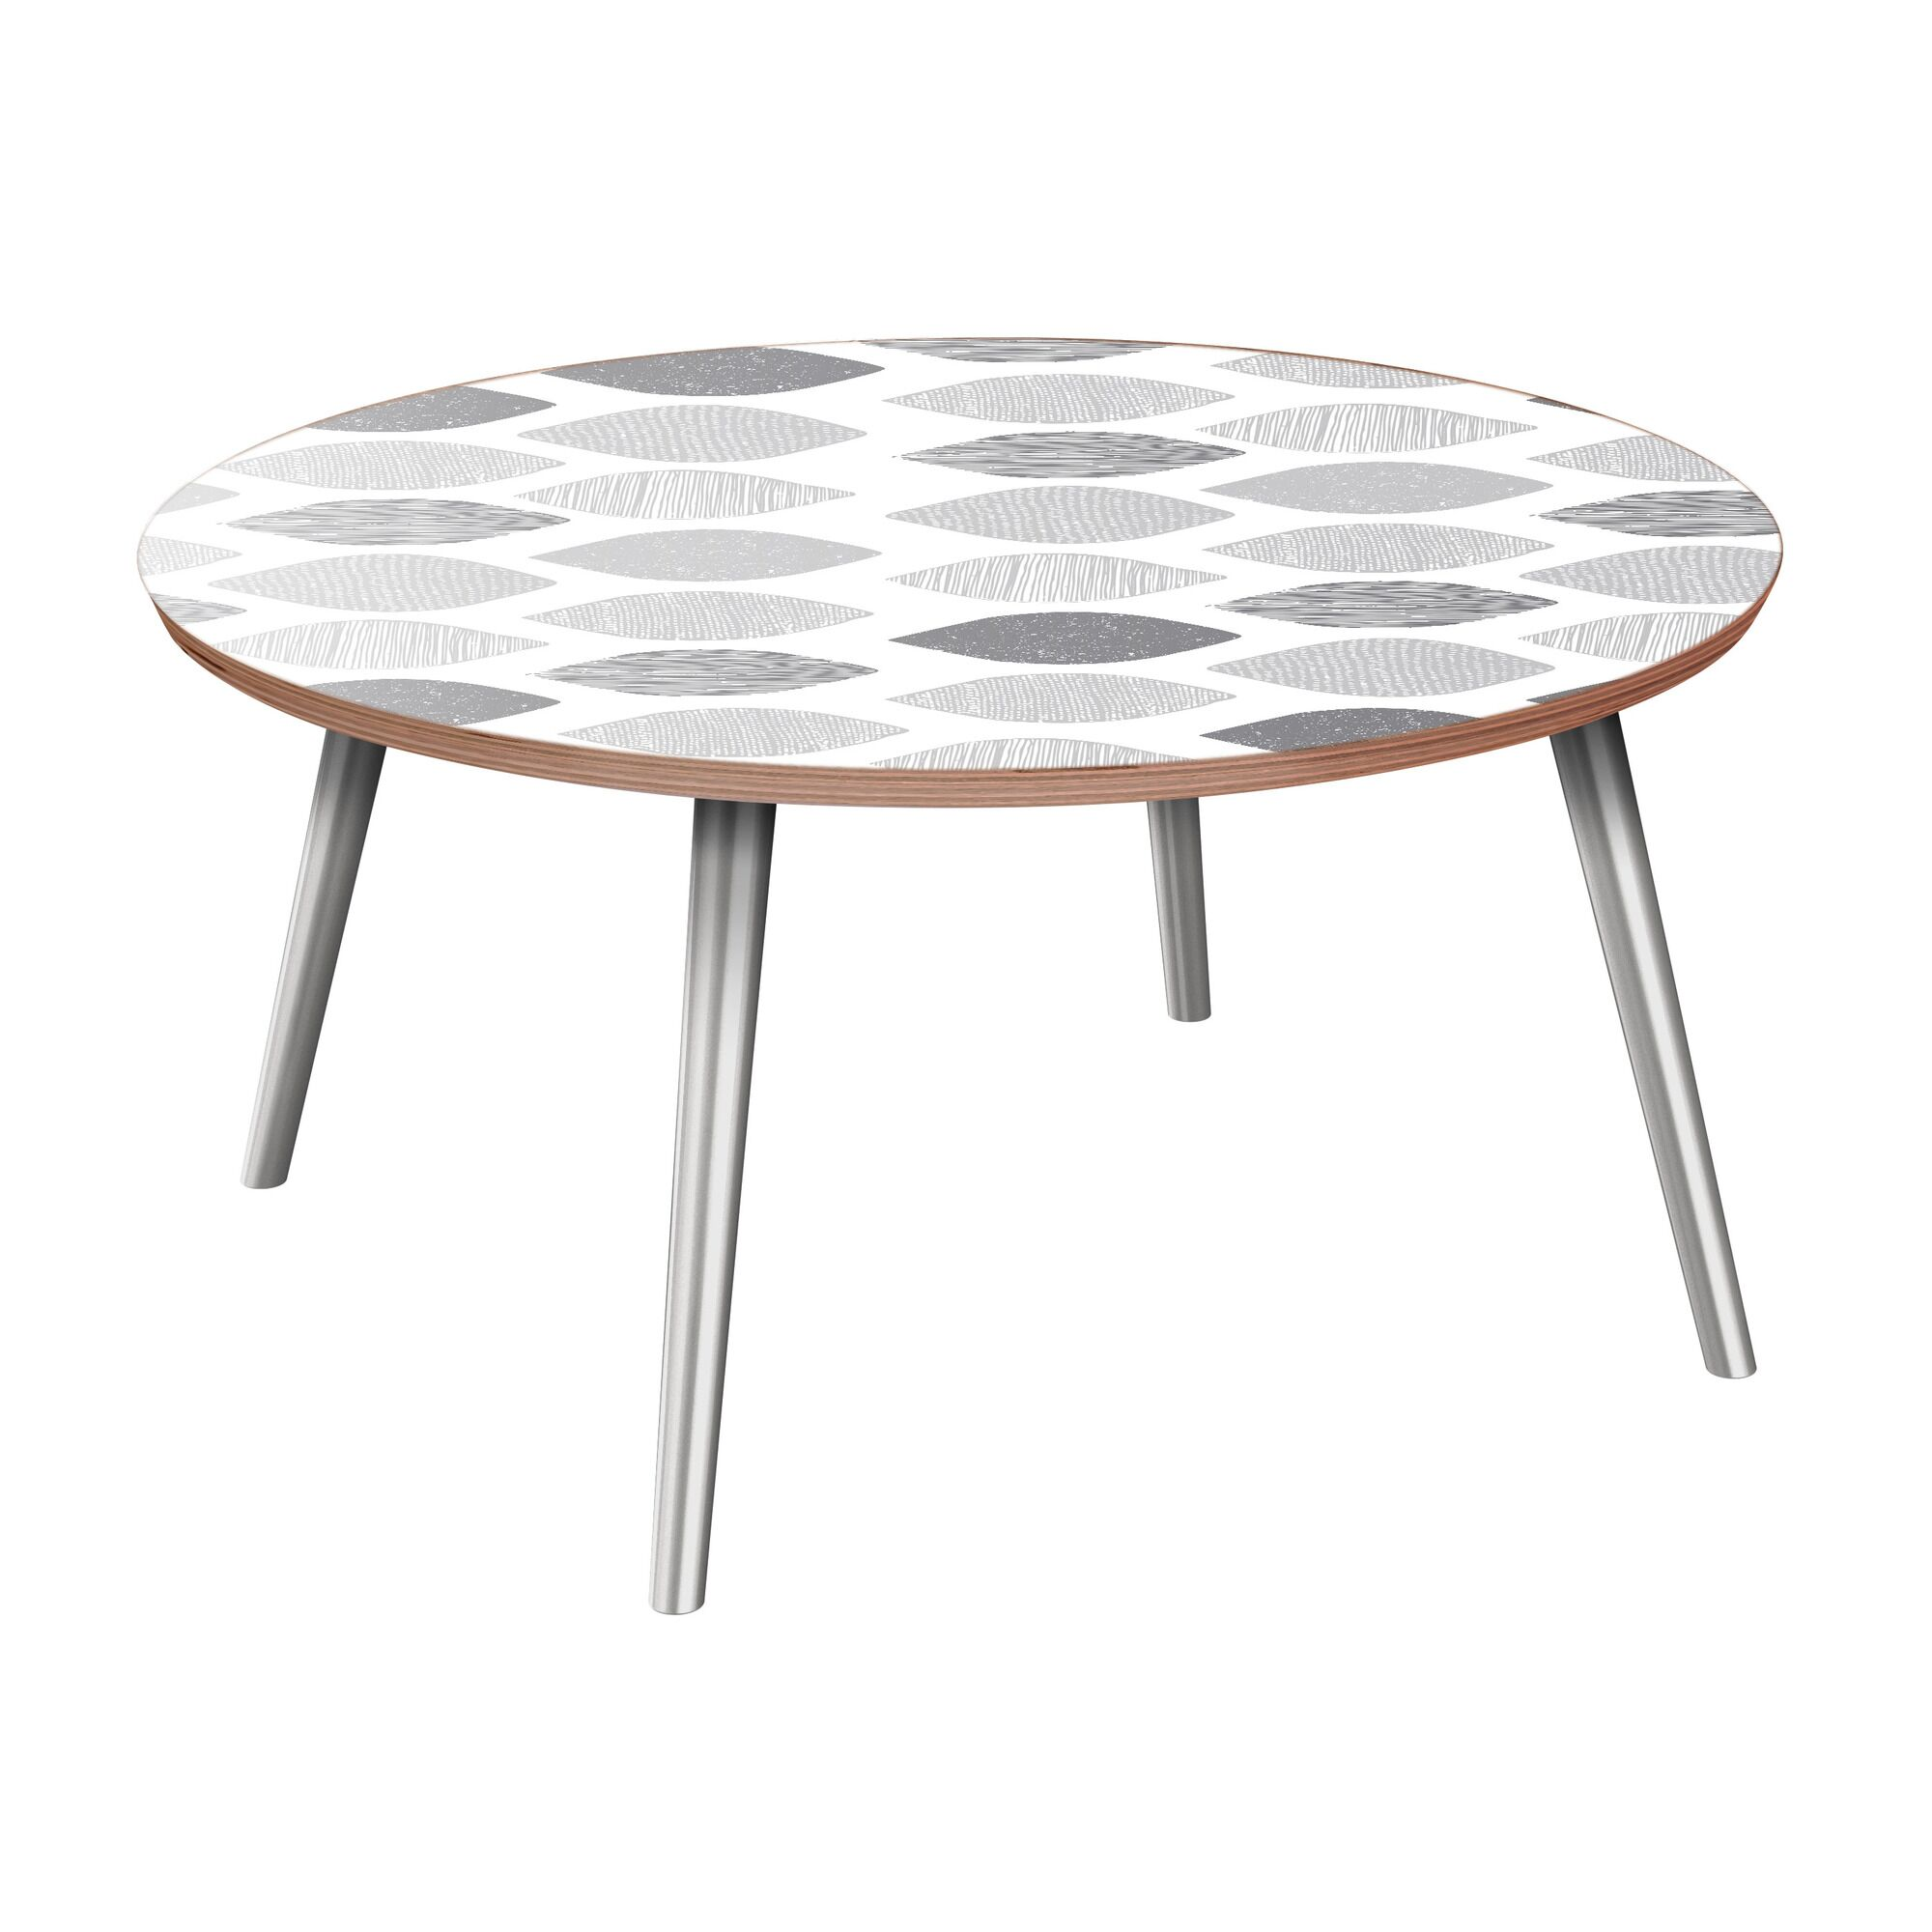 Kada Coffee Table Table Base Color: Chrome, Table Top Color: Walnut